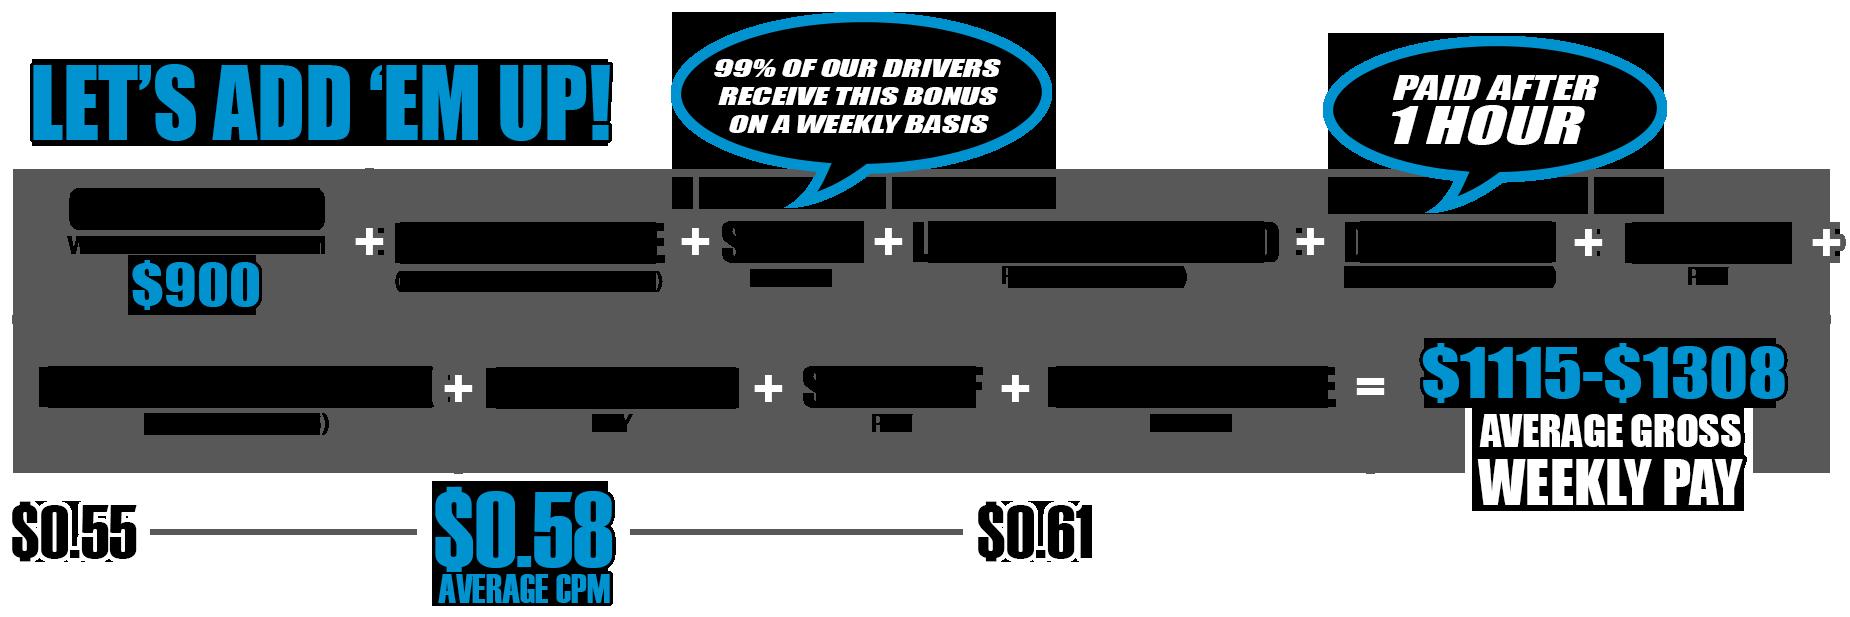 Keller Trucking Semi-Regional Pay Package